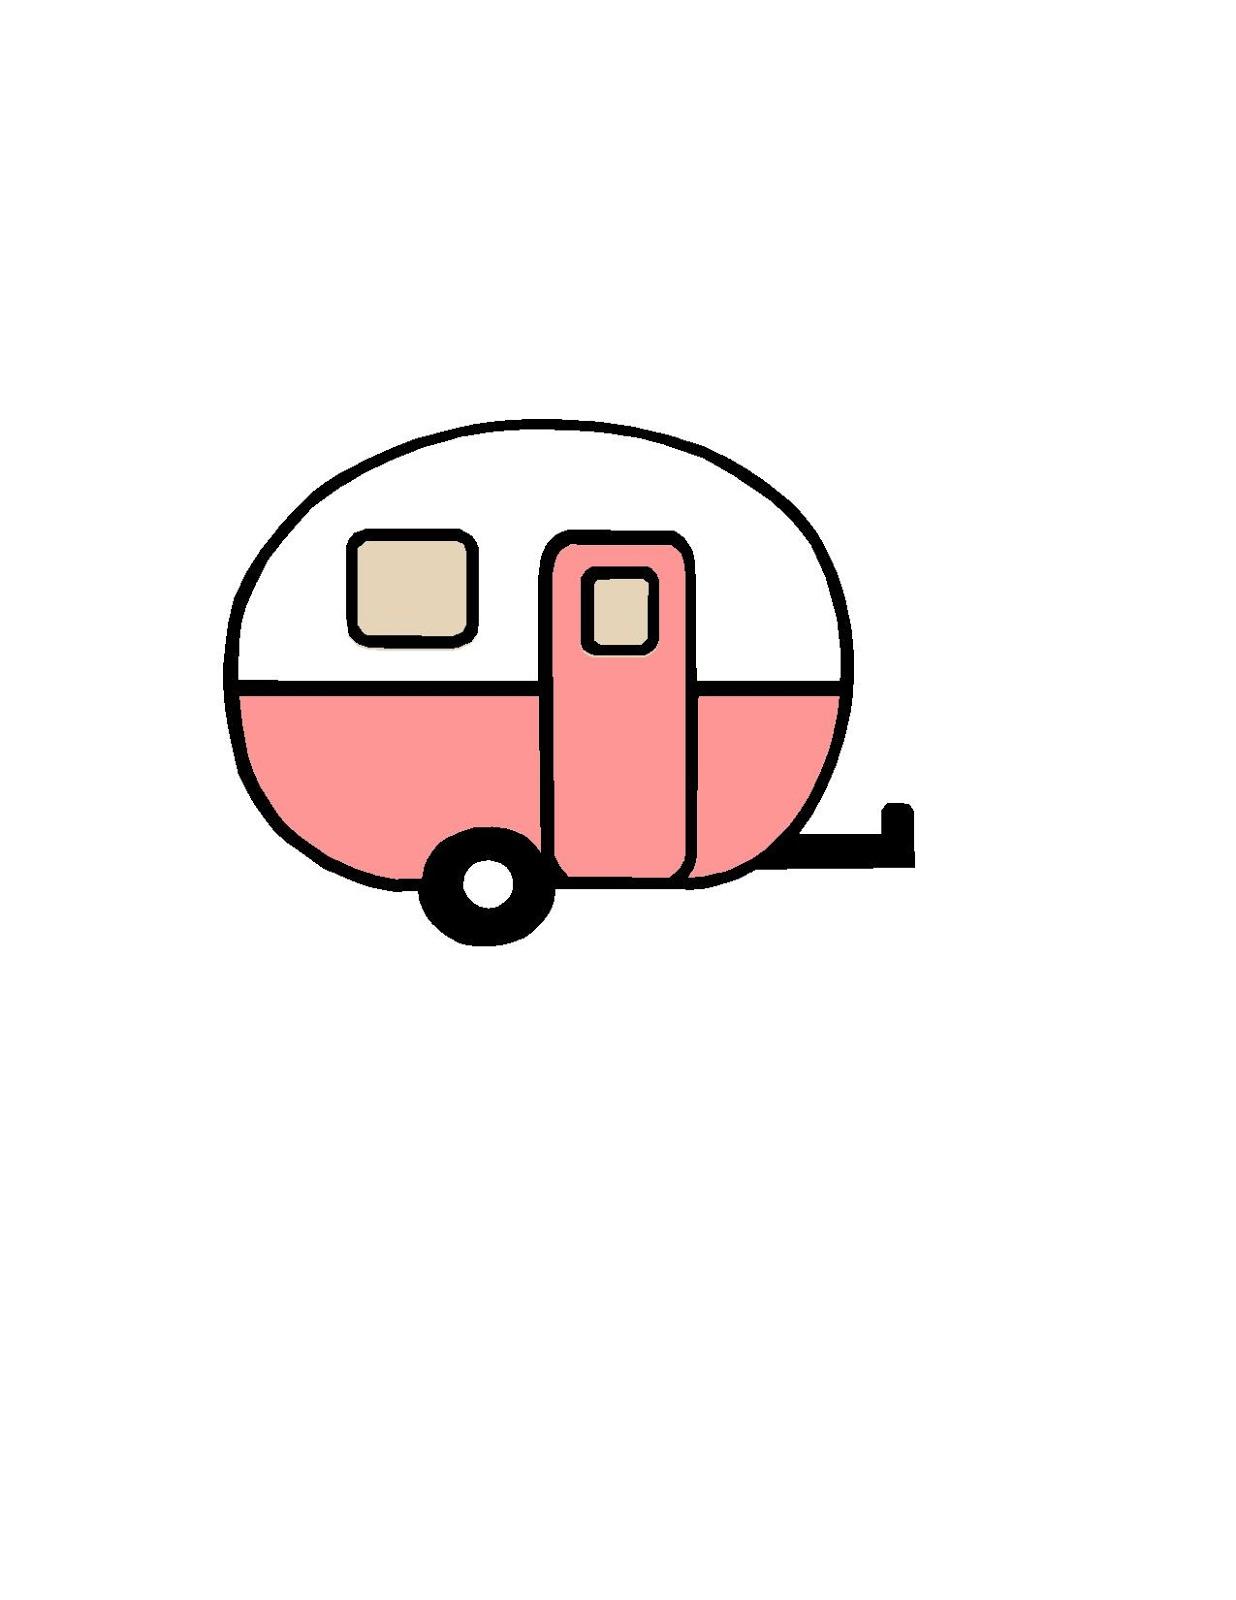 1236x1600 Closet Crafter Free Vintage Camper Silhouette Design File